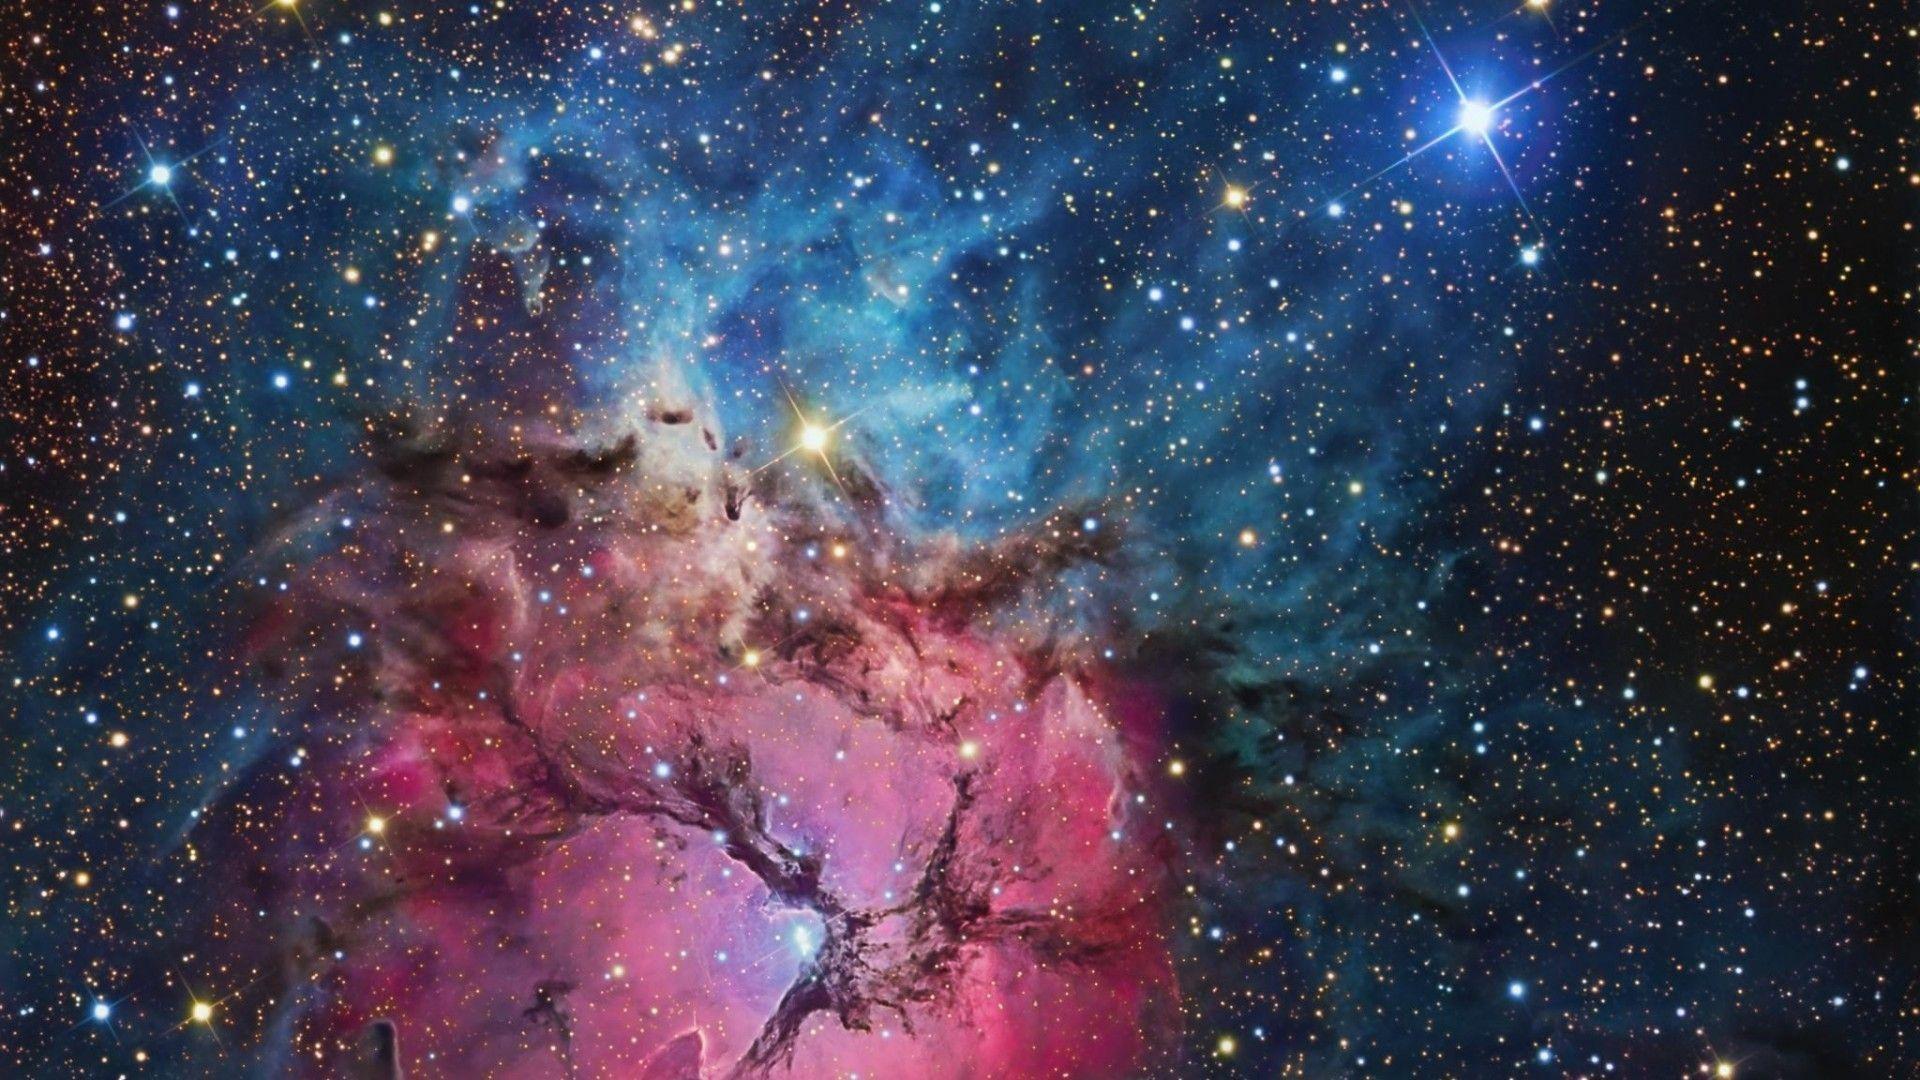 hubble space wallpaper (60+ images)